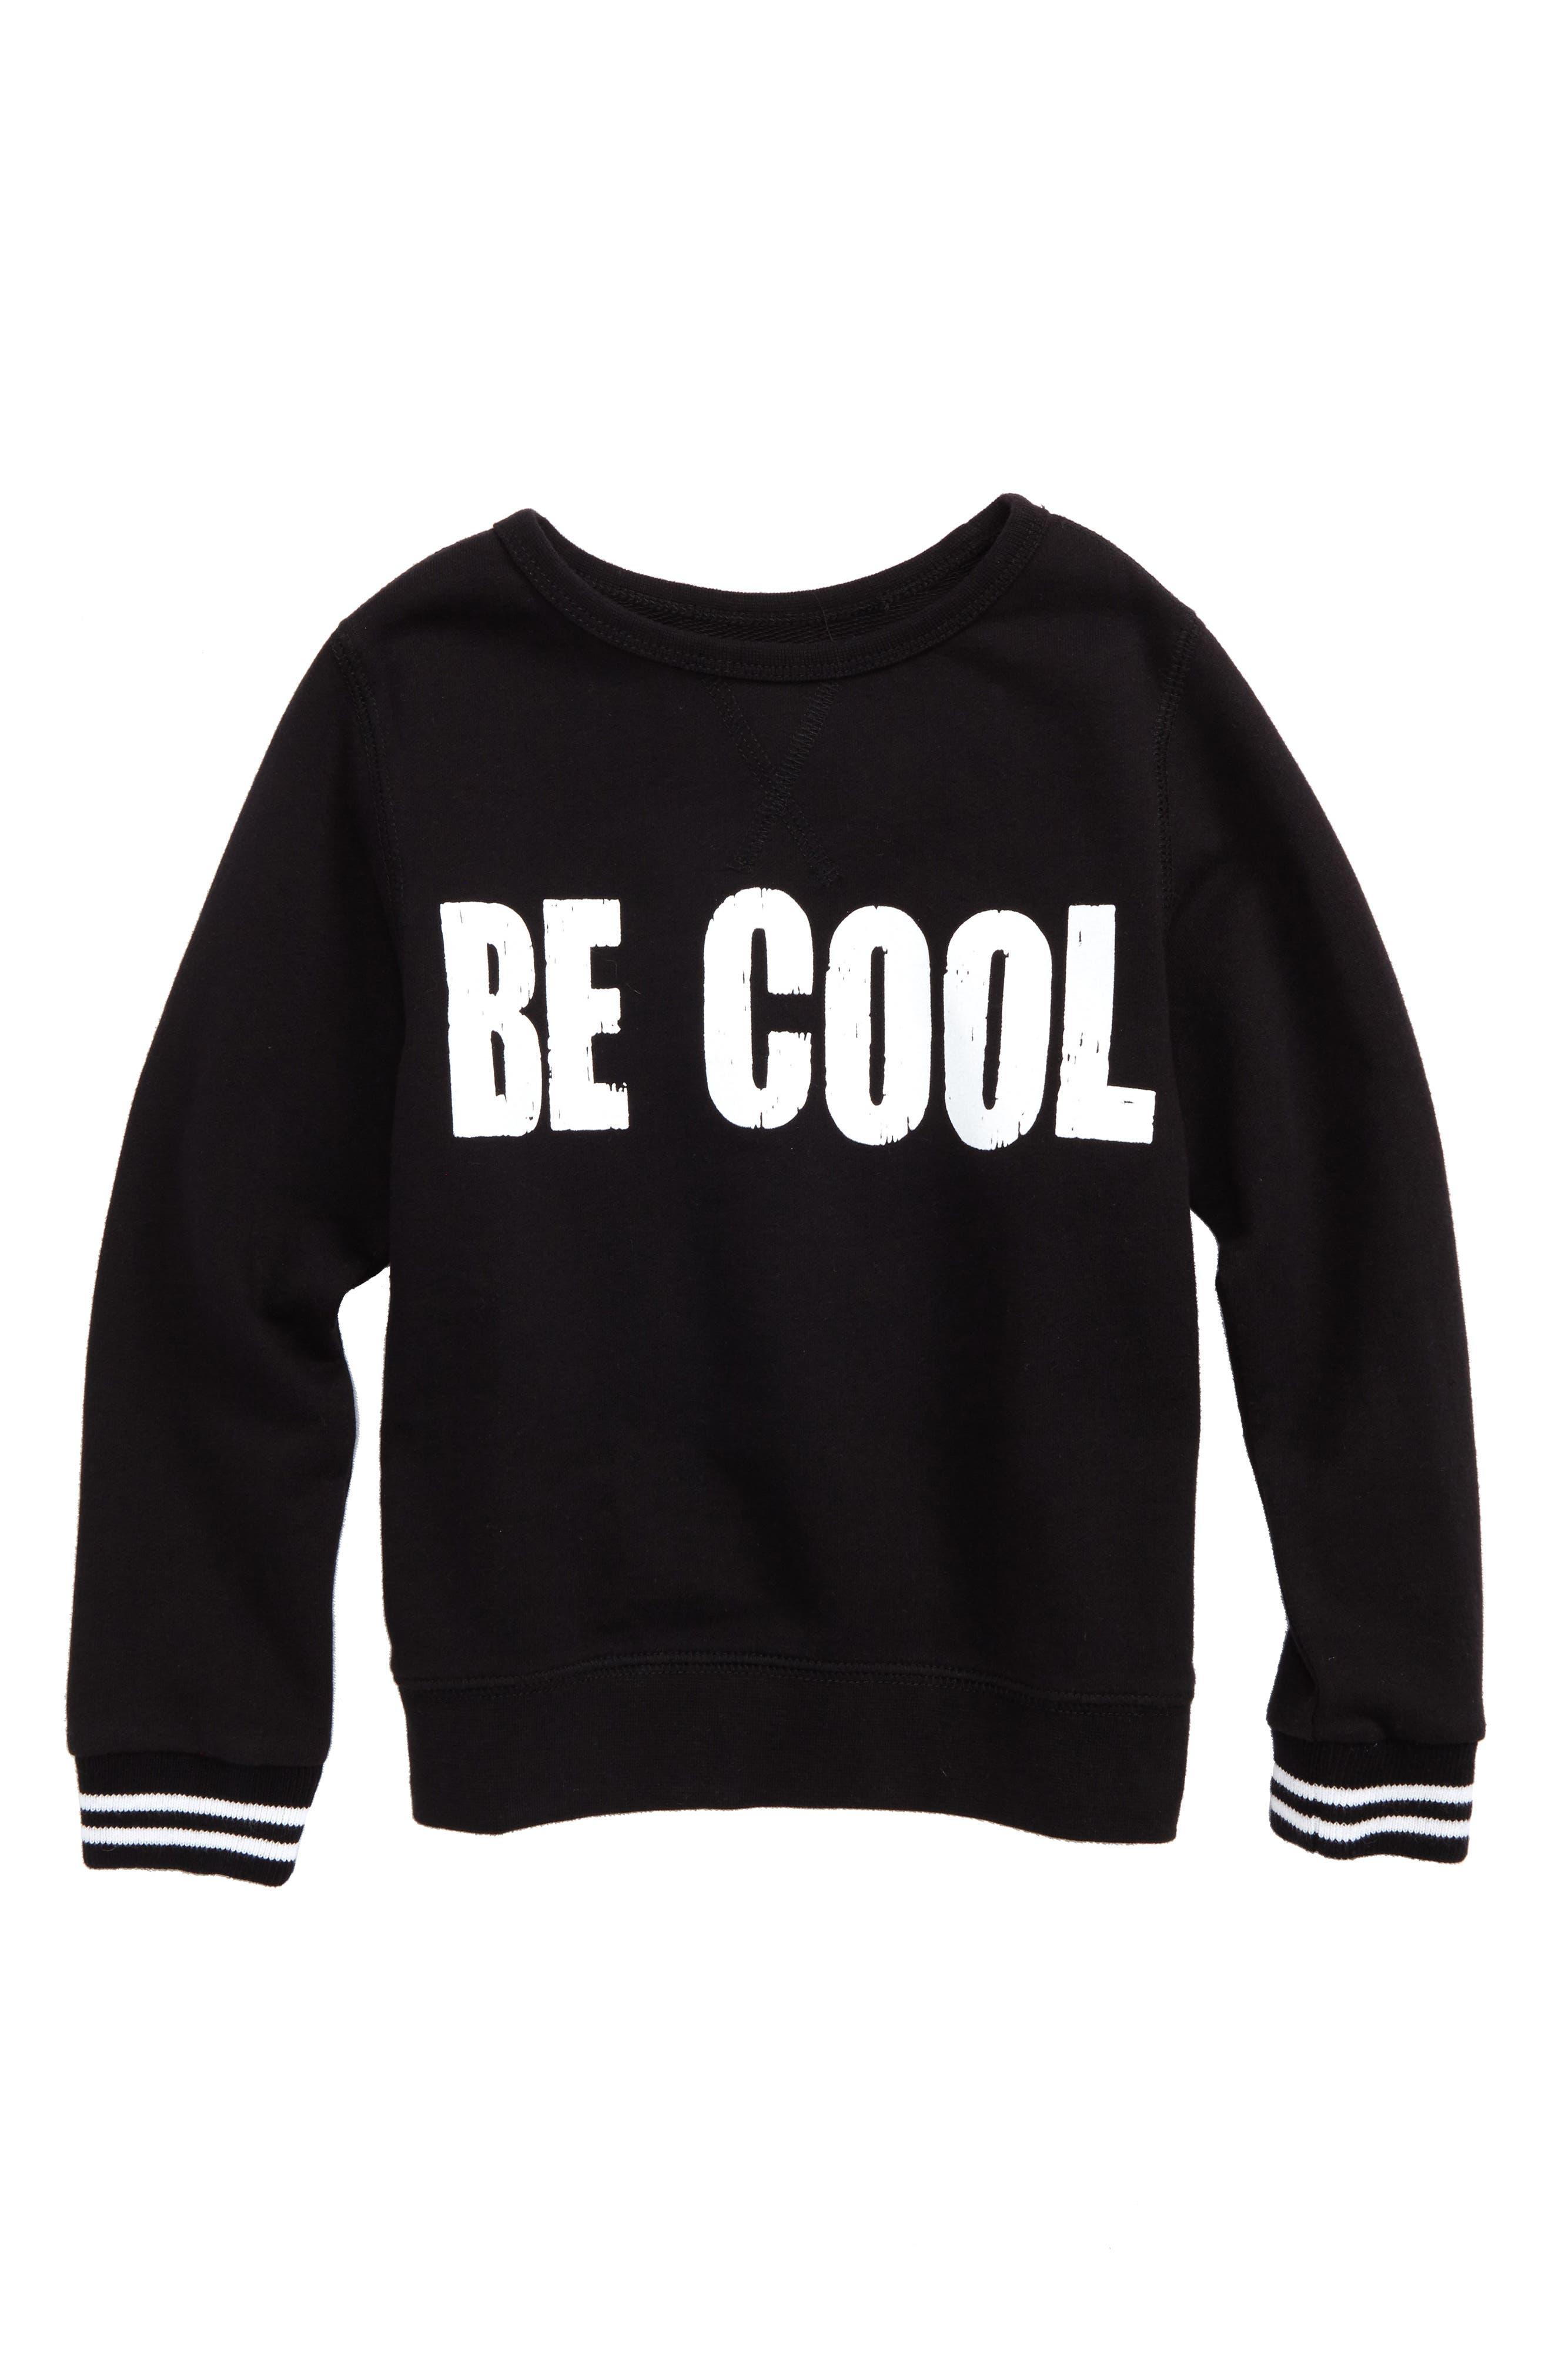 Alternate Image 1 Selected - Peek Be Cool Graphic Sweatshirt (Toddler Boys, Little Boys & Big Boys)